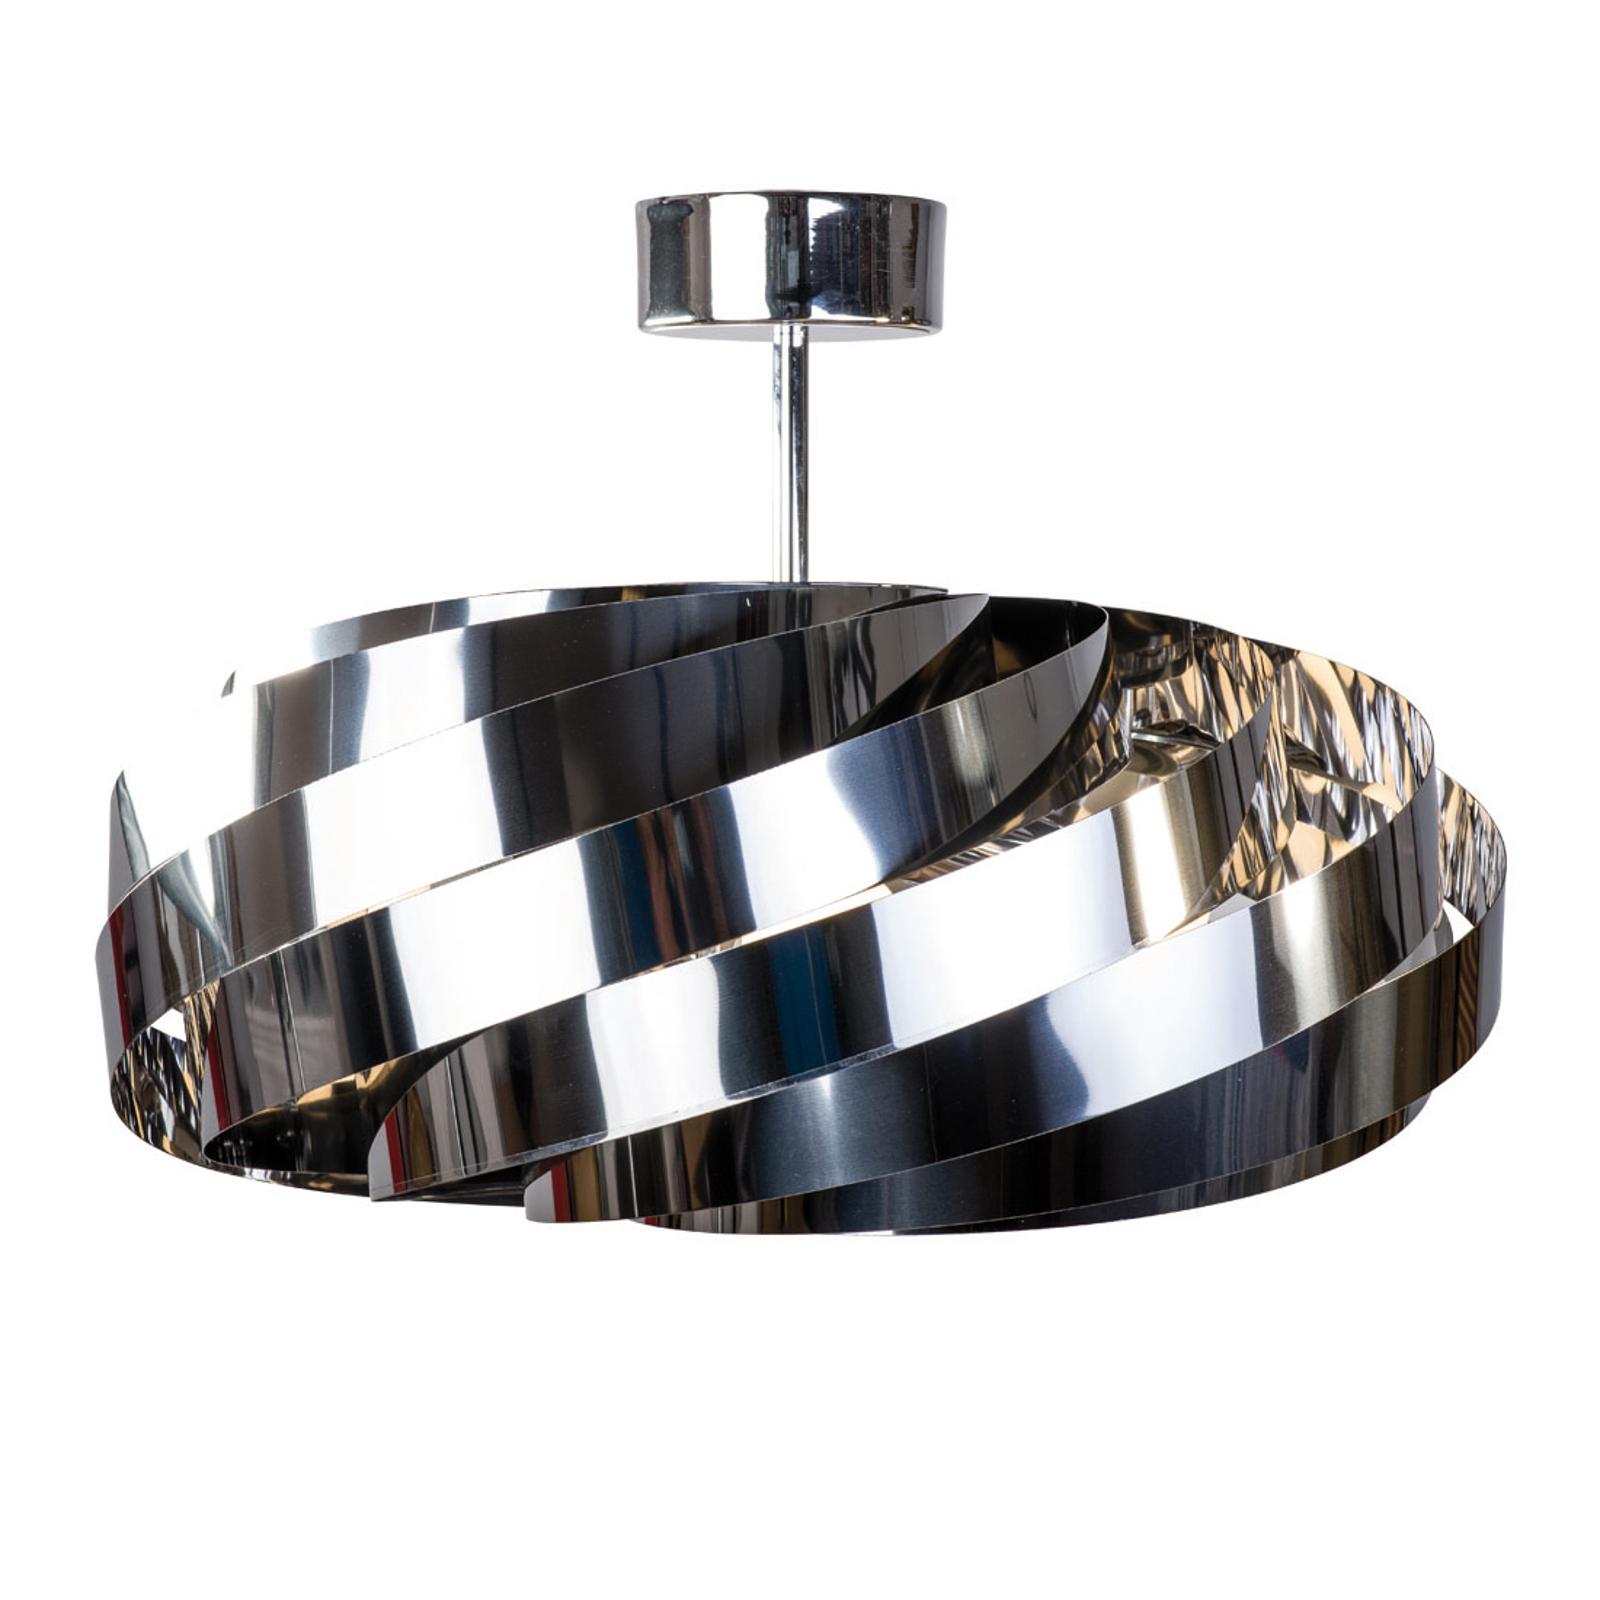 Kattovalaisin Vento, kromi-nikkeli, Ø 60 cm